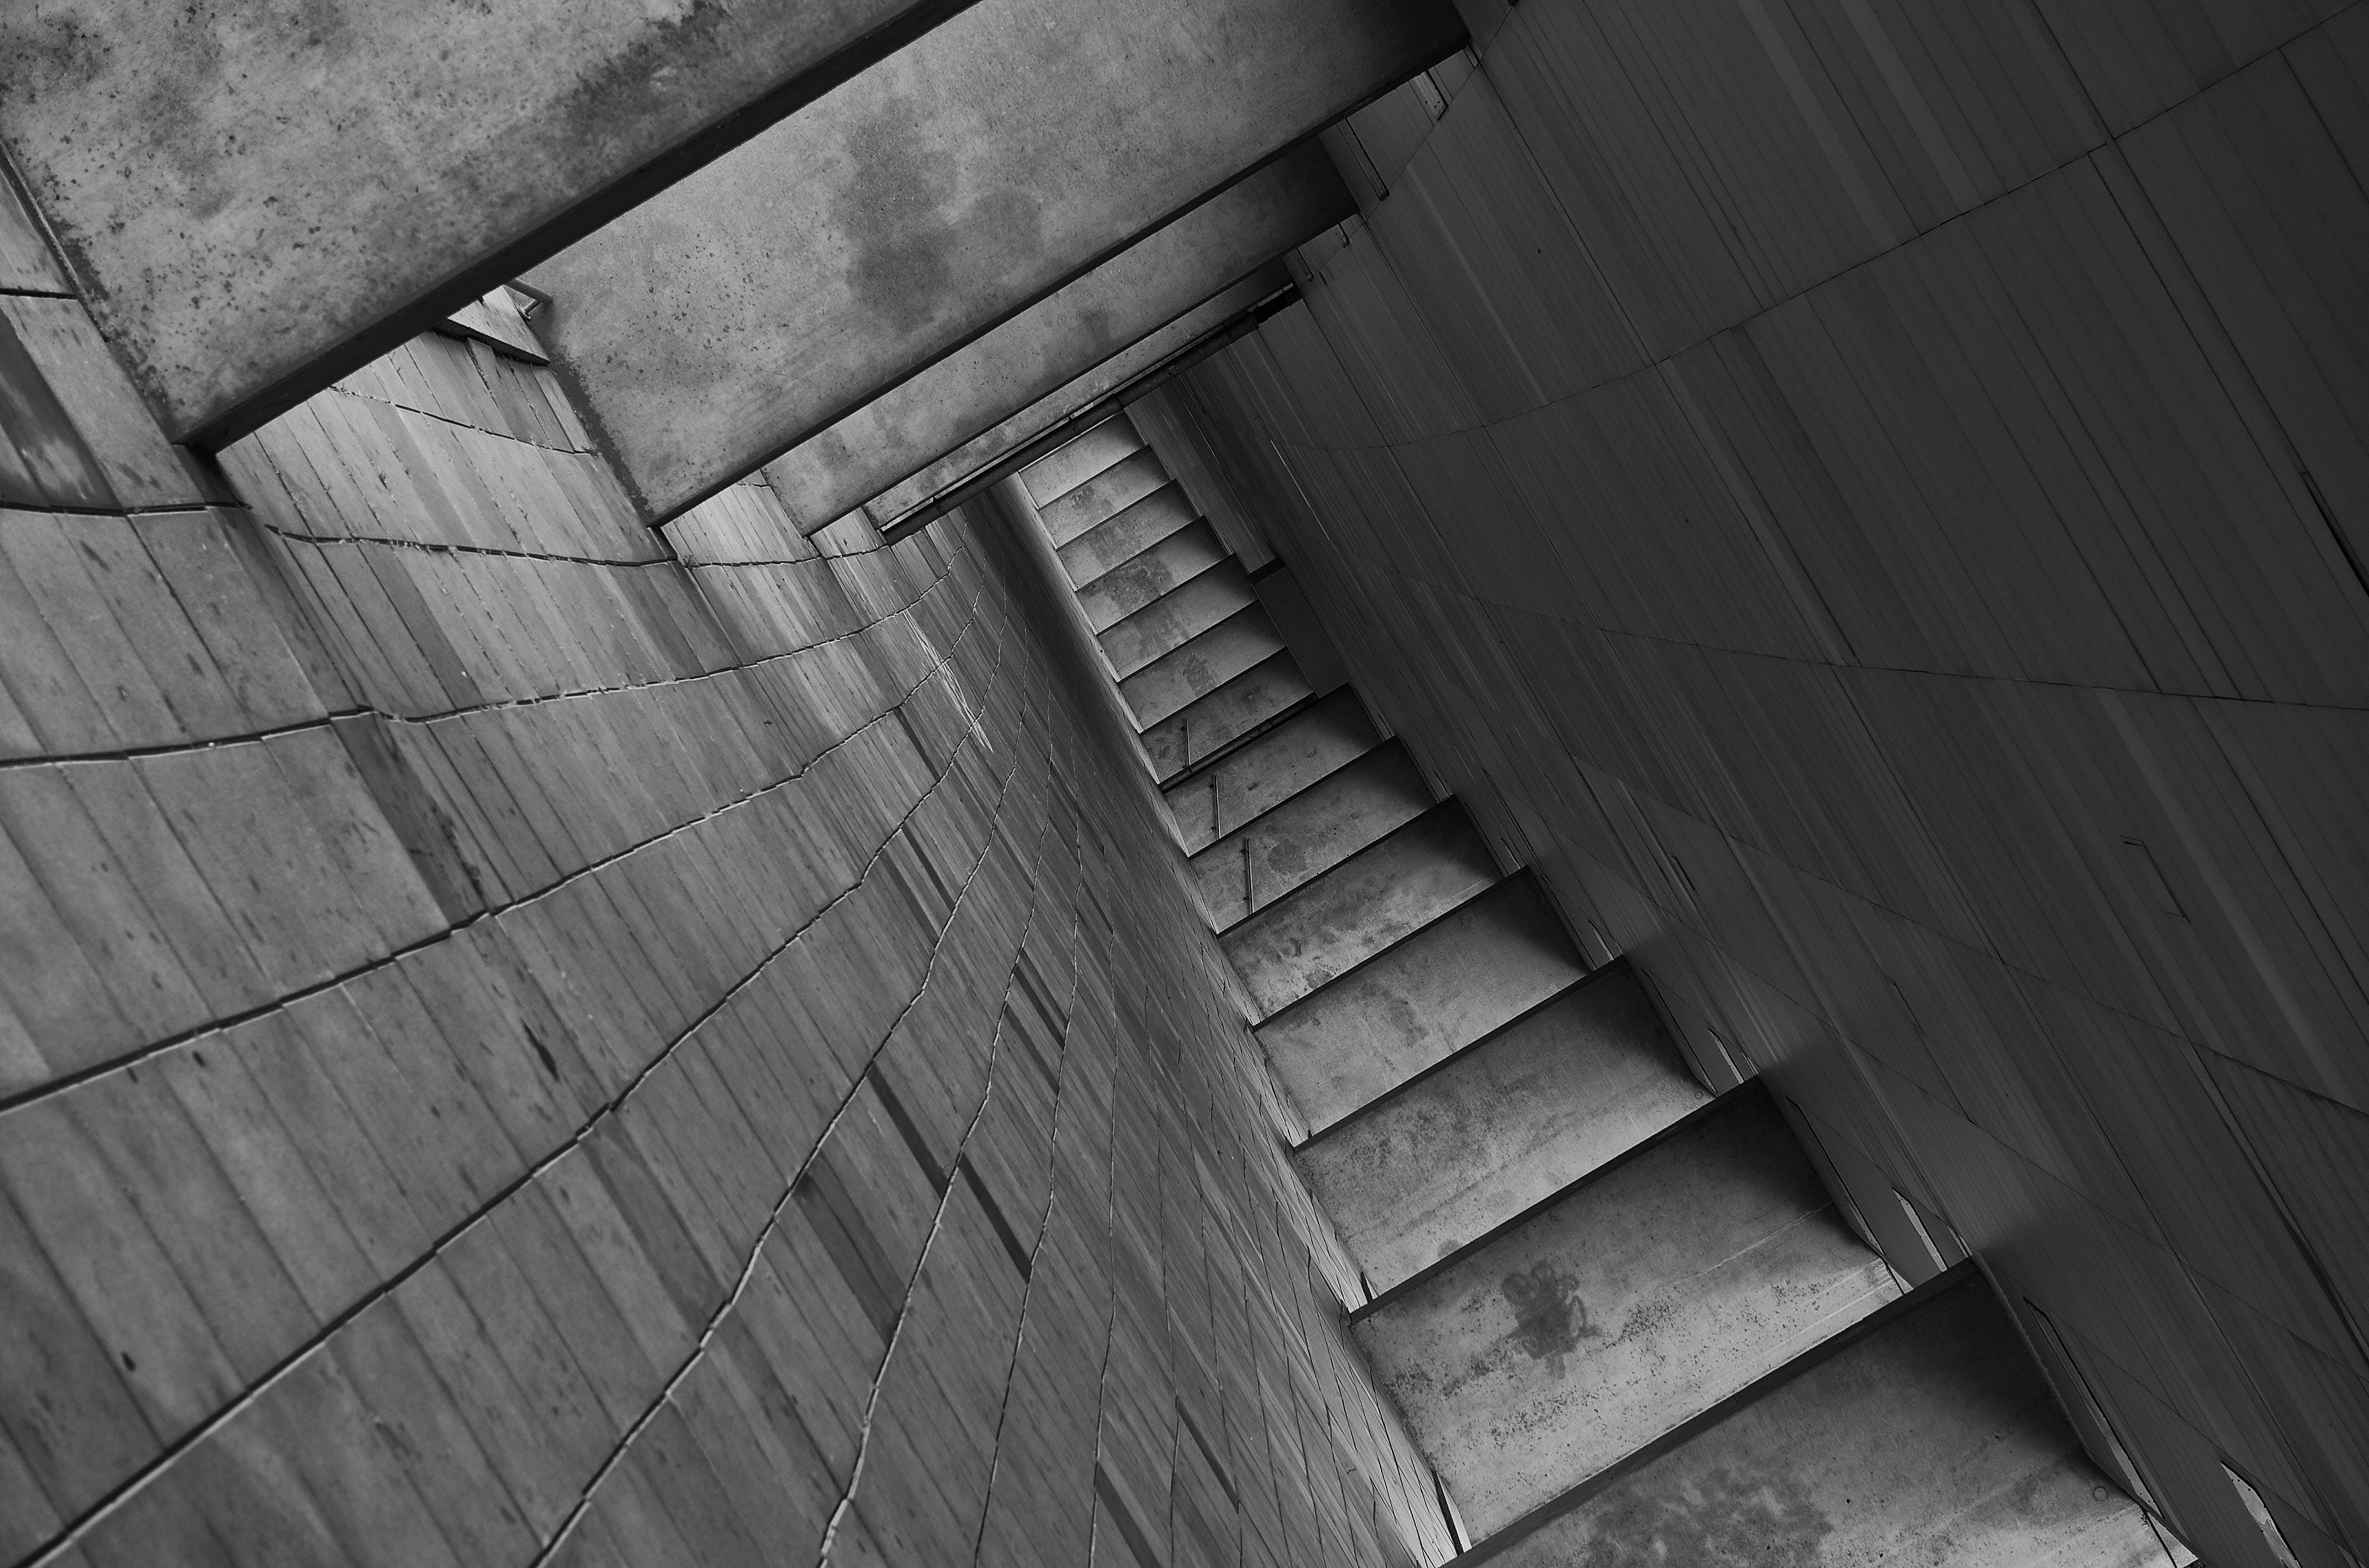 Empty Walkway Black and White Photo